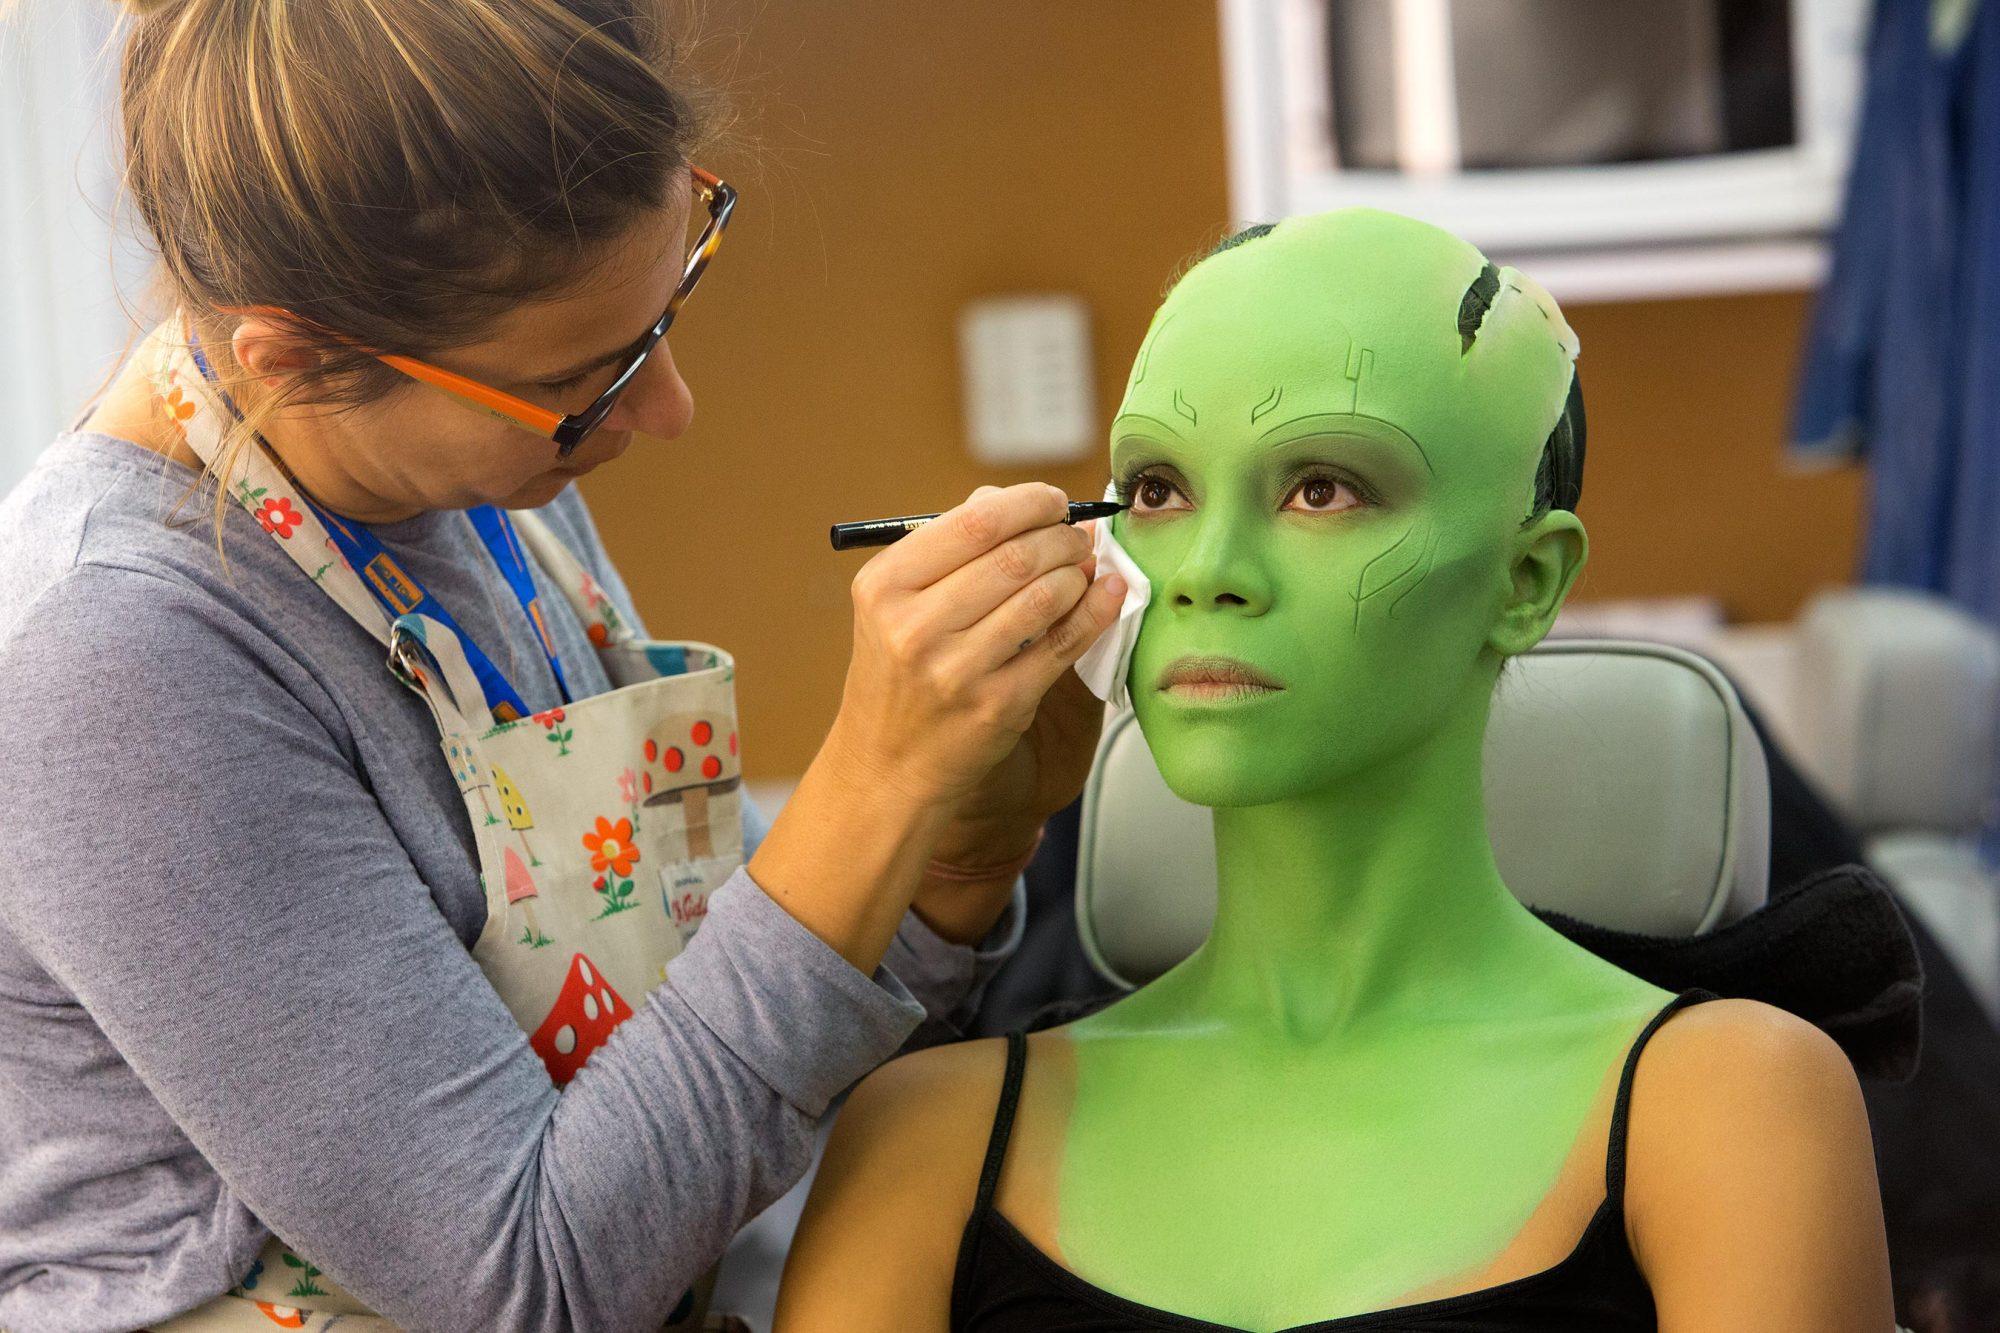 MARVEL'S GUARDIANS OF THE GALAXY: VOL. 2Zoe Saldana on set